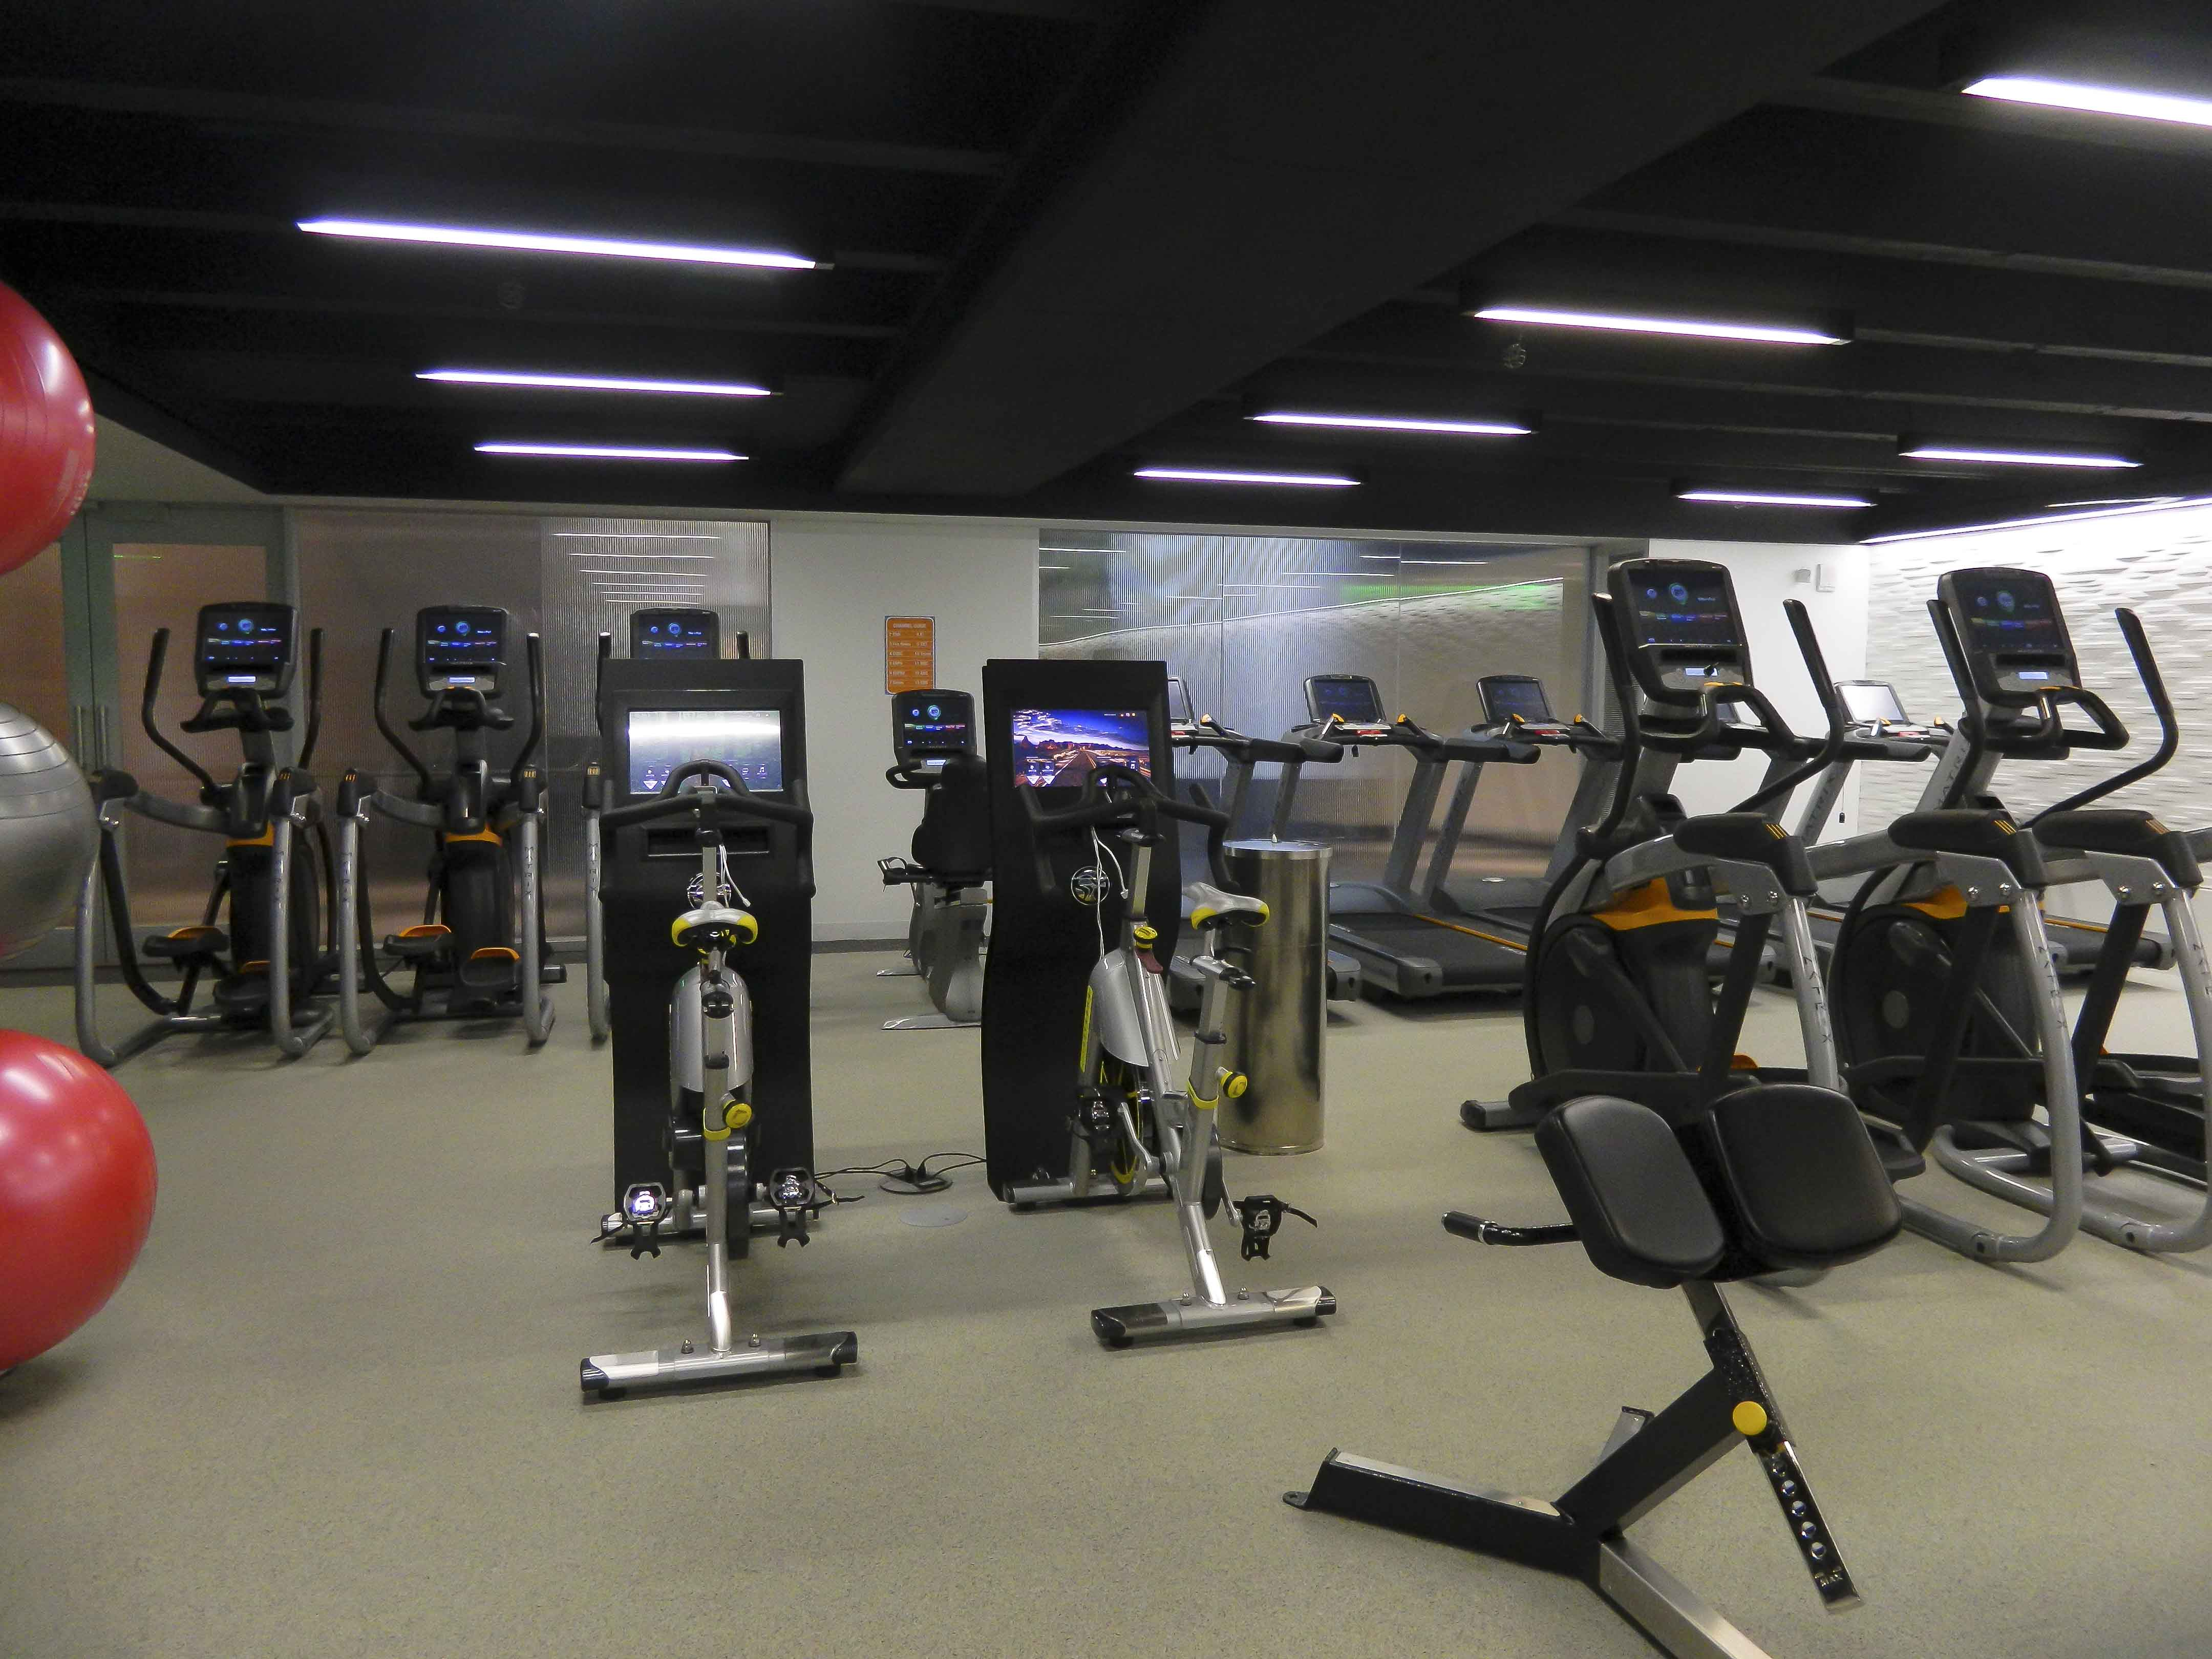 Gym planning